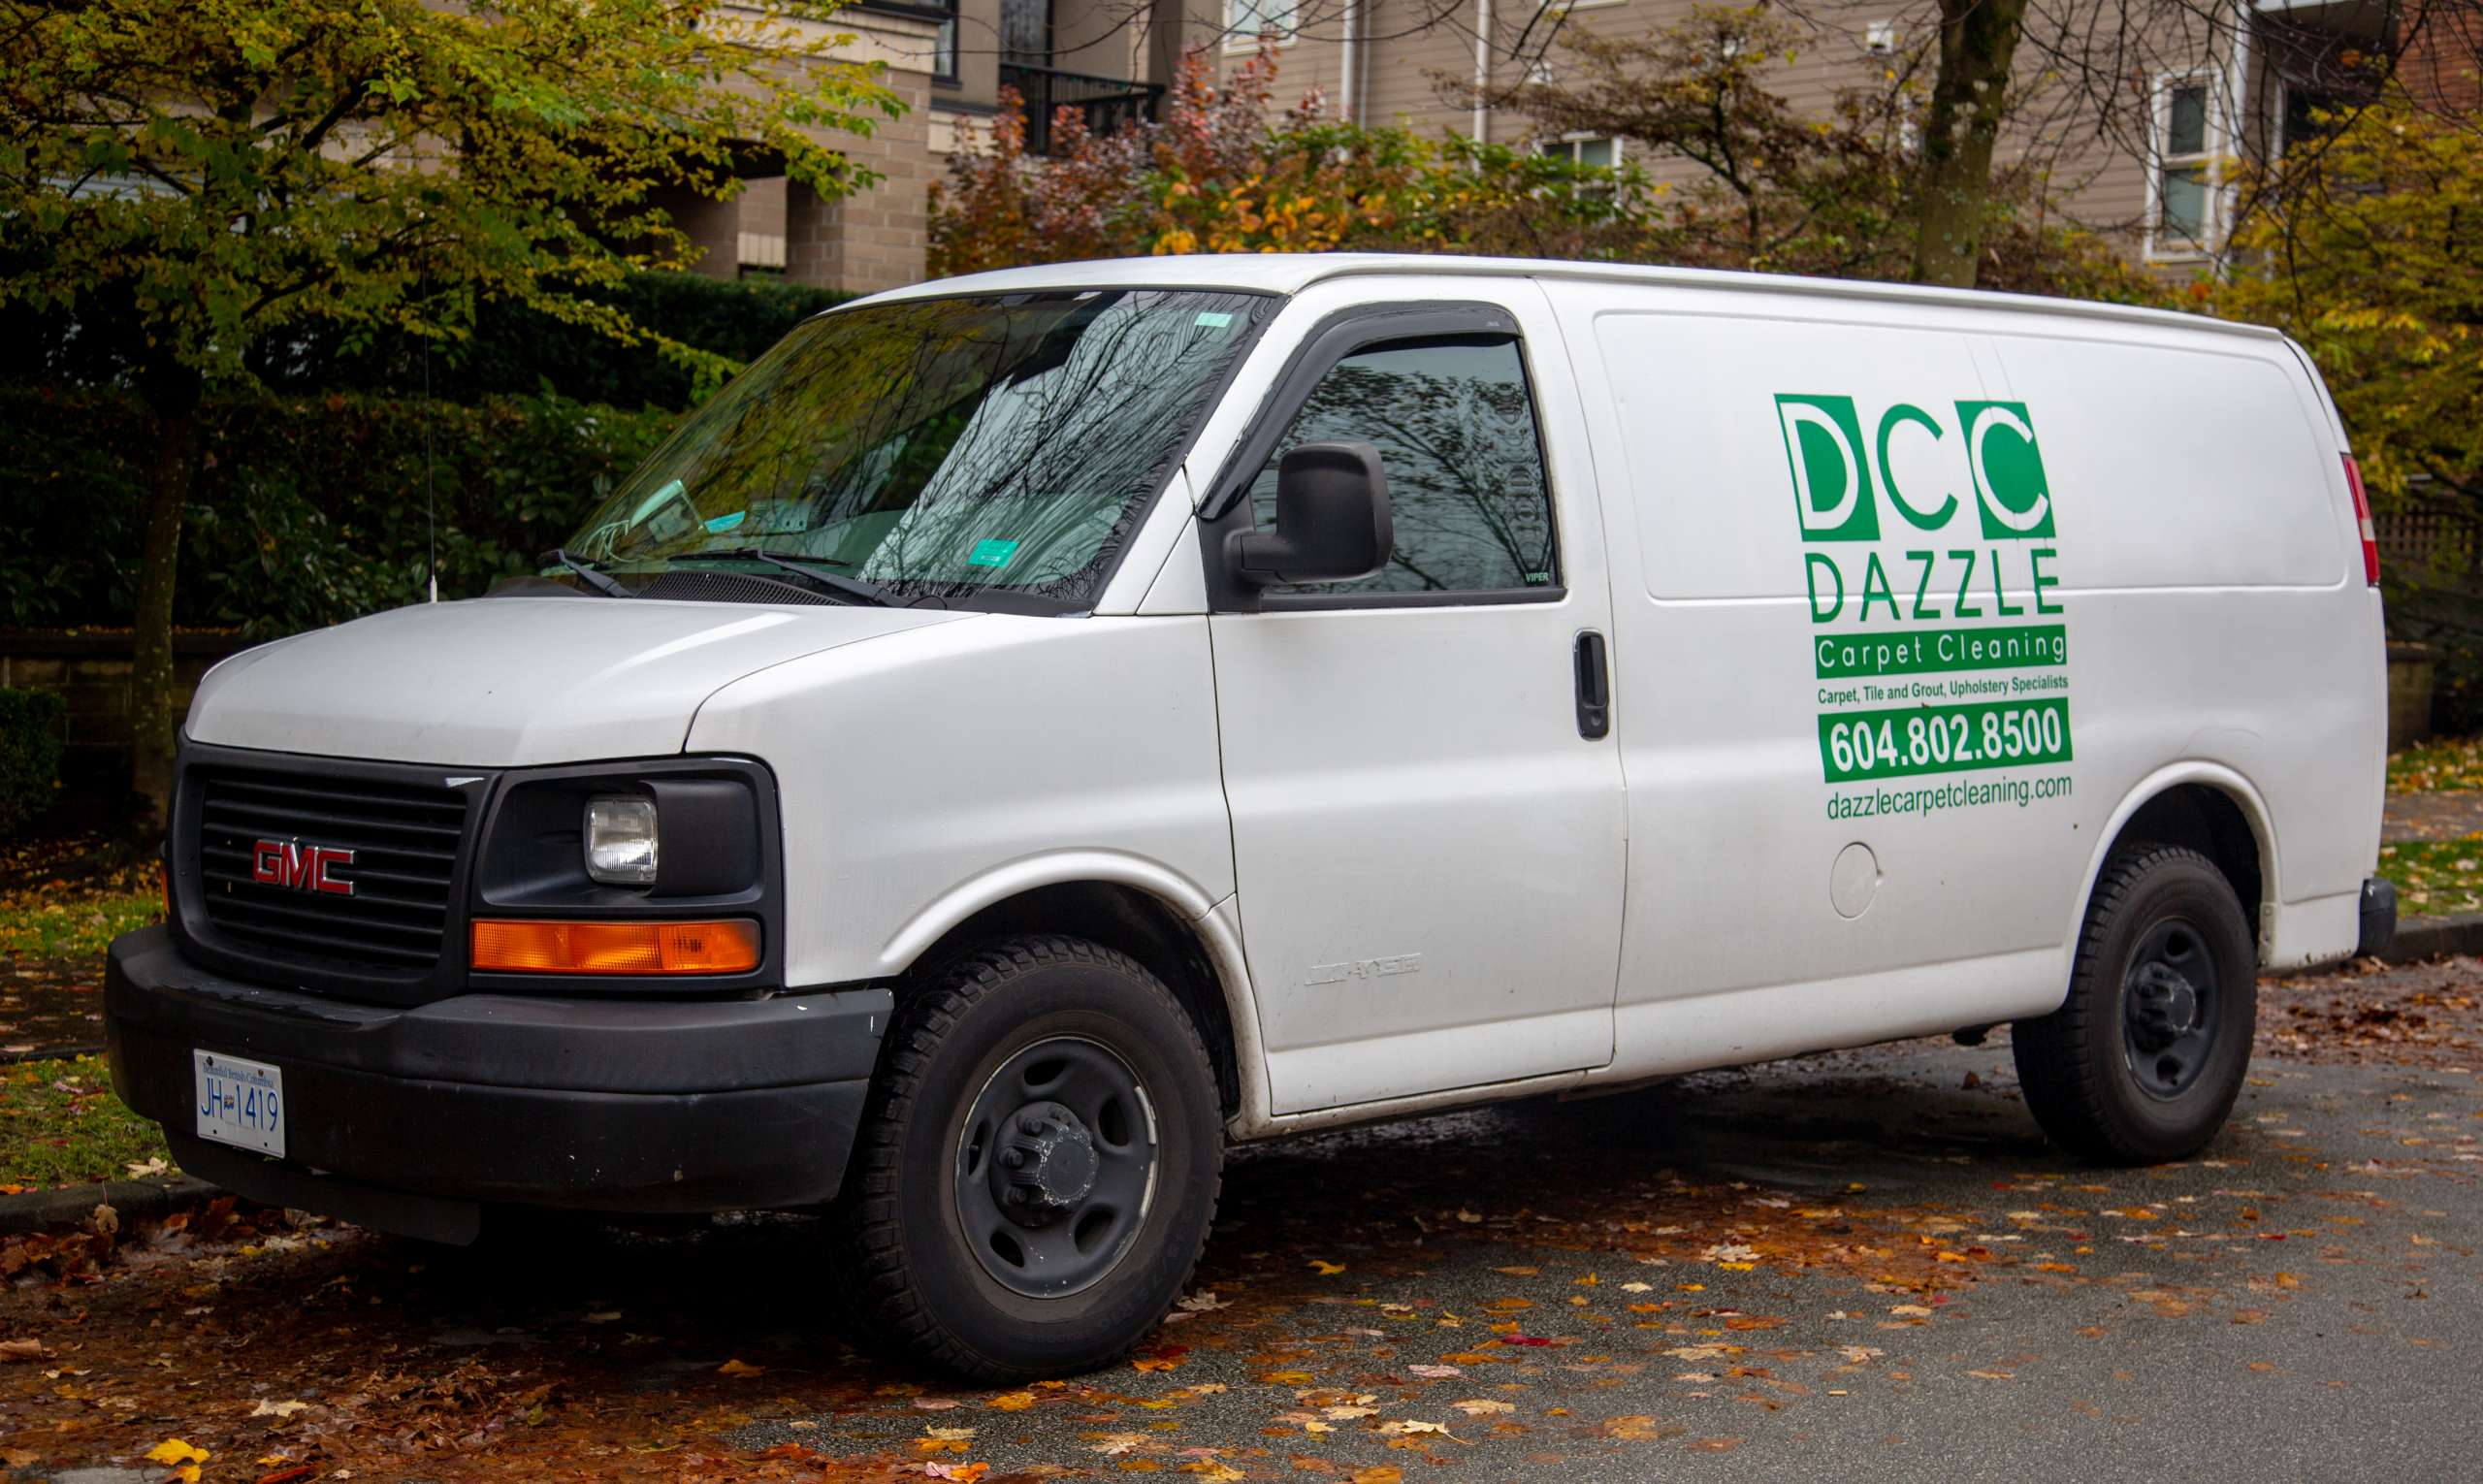 Commercial Cleaning Services Richmond: Dazzle CC